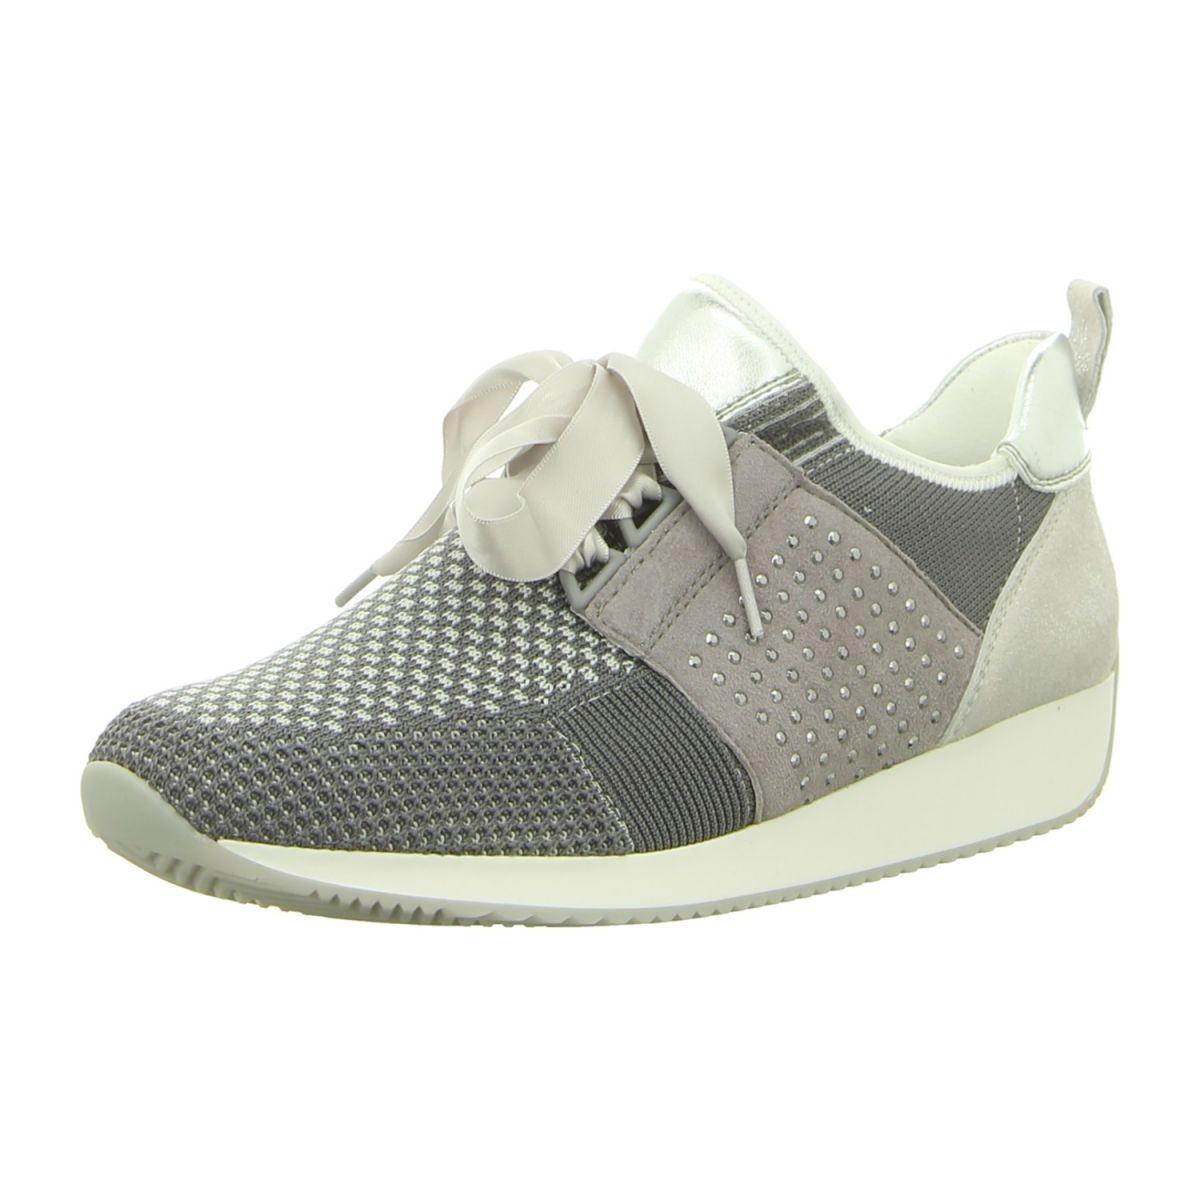 Ara Damen Sneaker Lissabon-Fusion 4 in grau kaufen ba575f581d